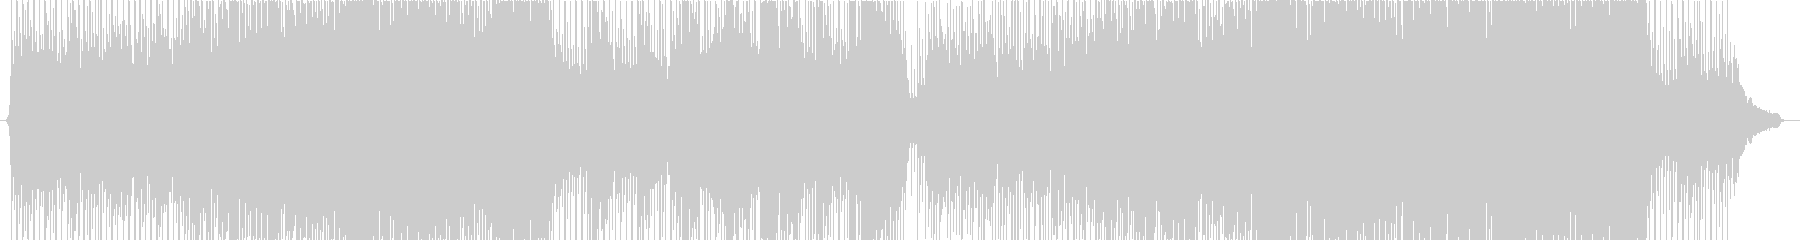 Folk Acoustickの未再生の波形